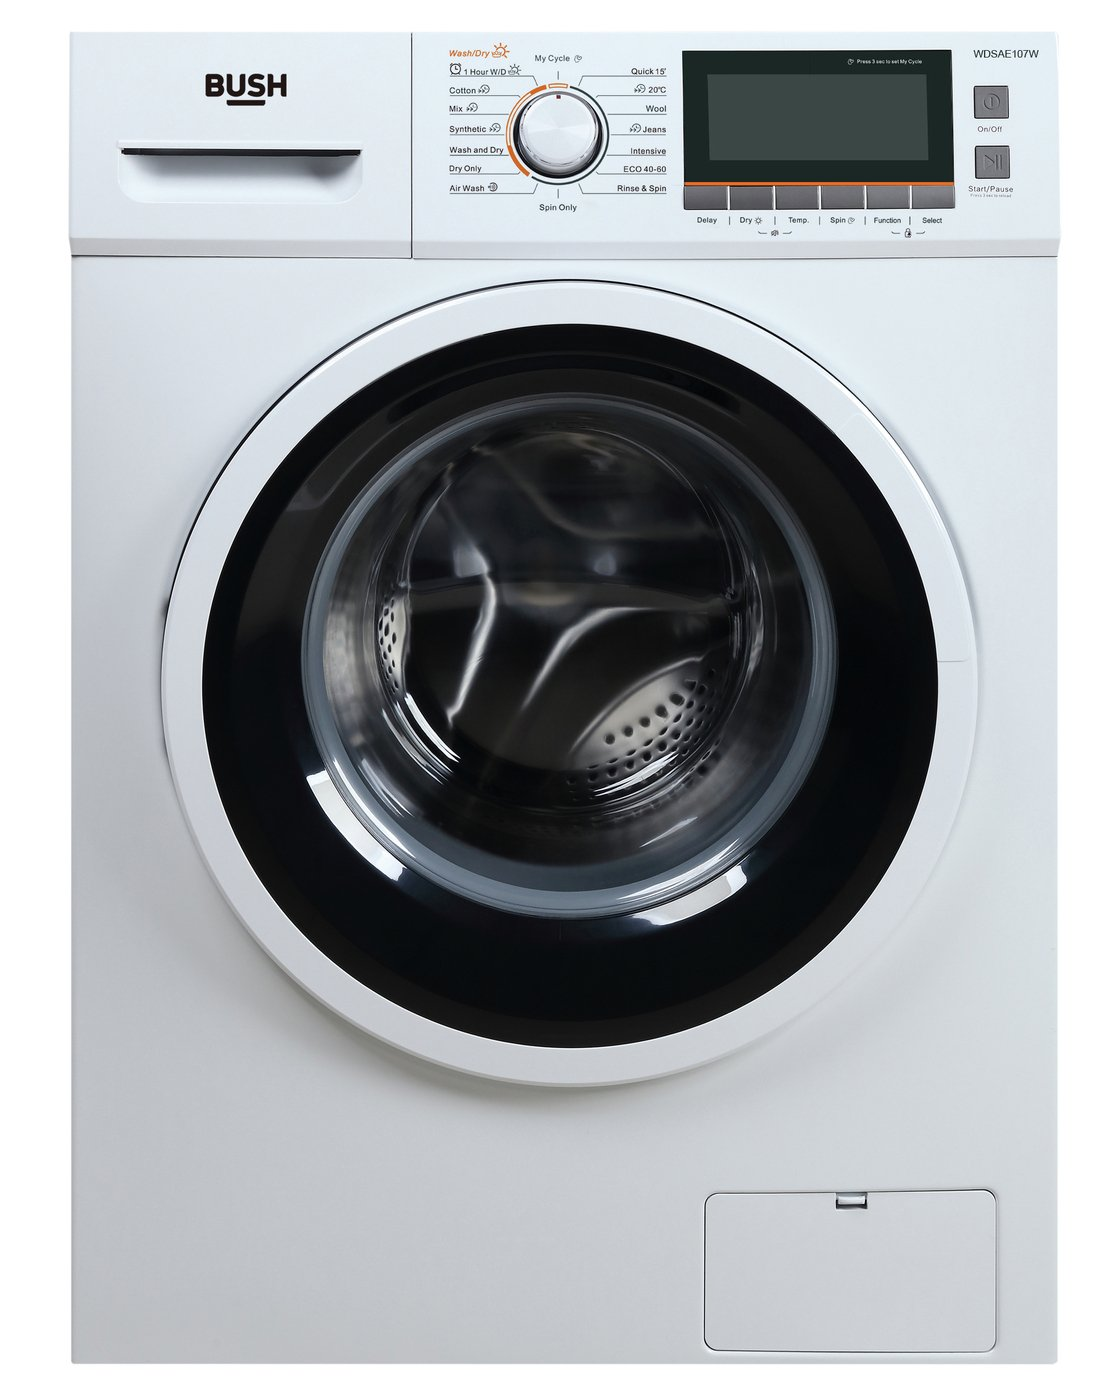 Bush WDSAE107W 9KG/10KG 1500 Spin Washer Dryer - White